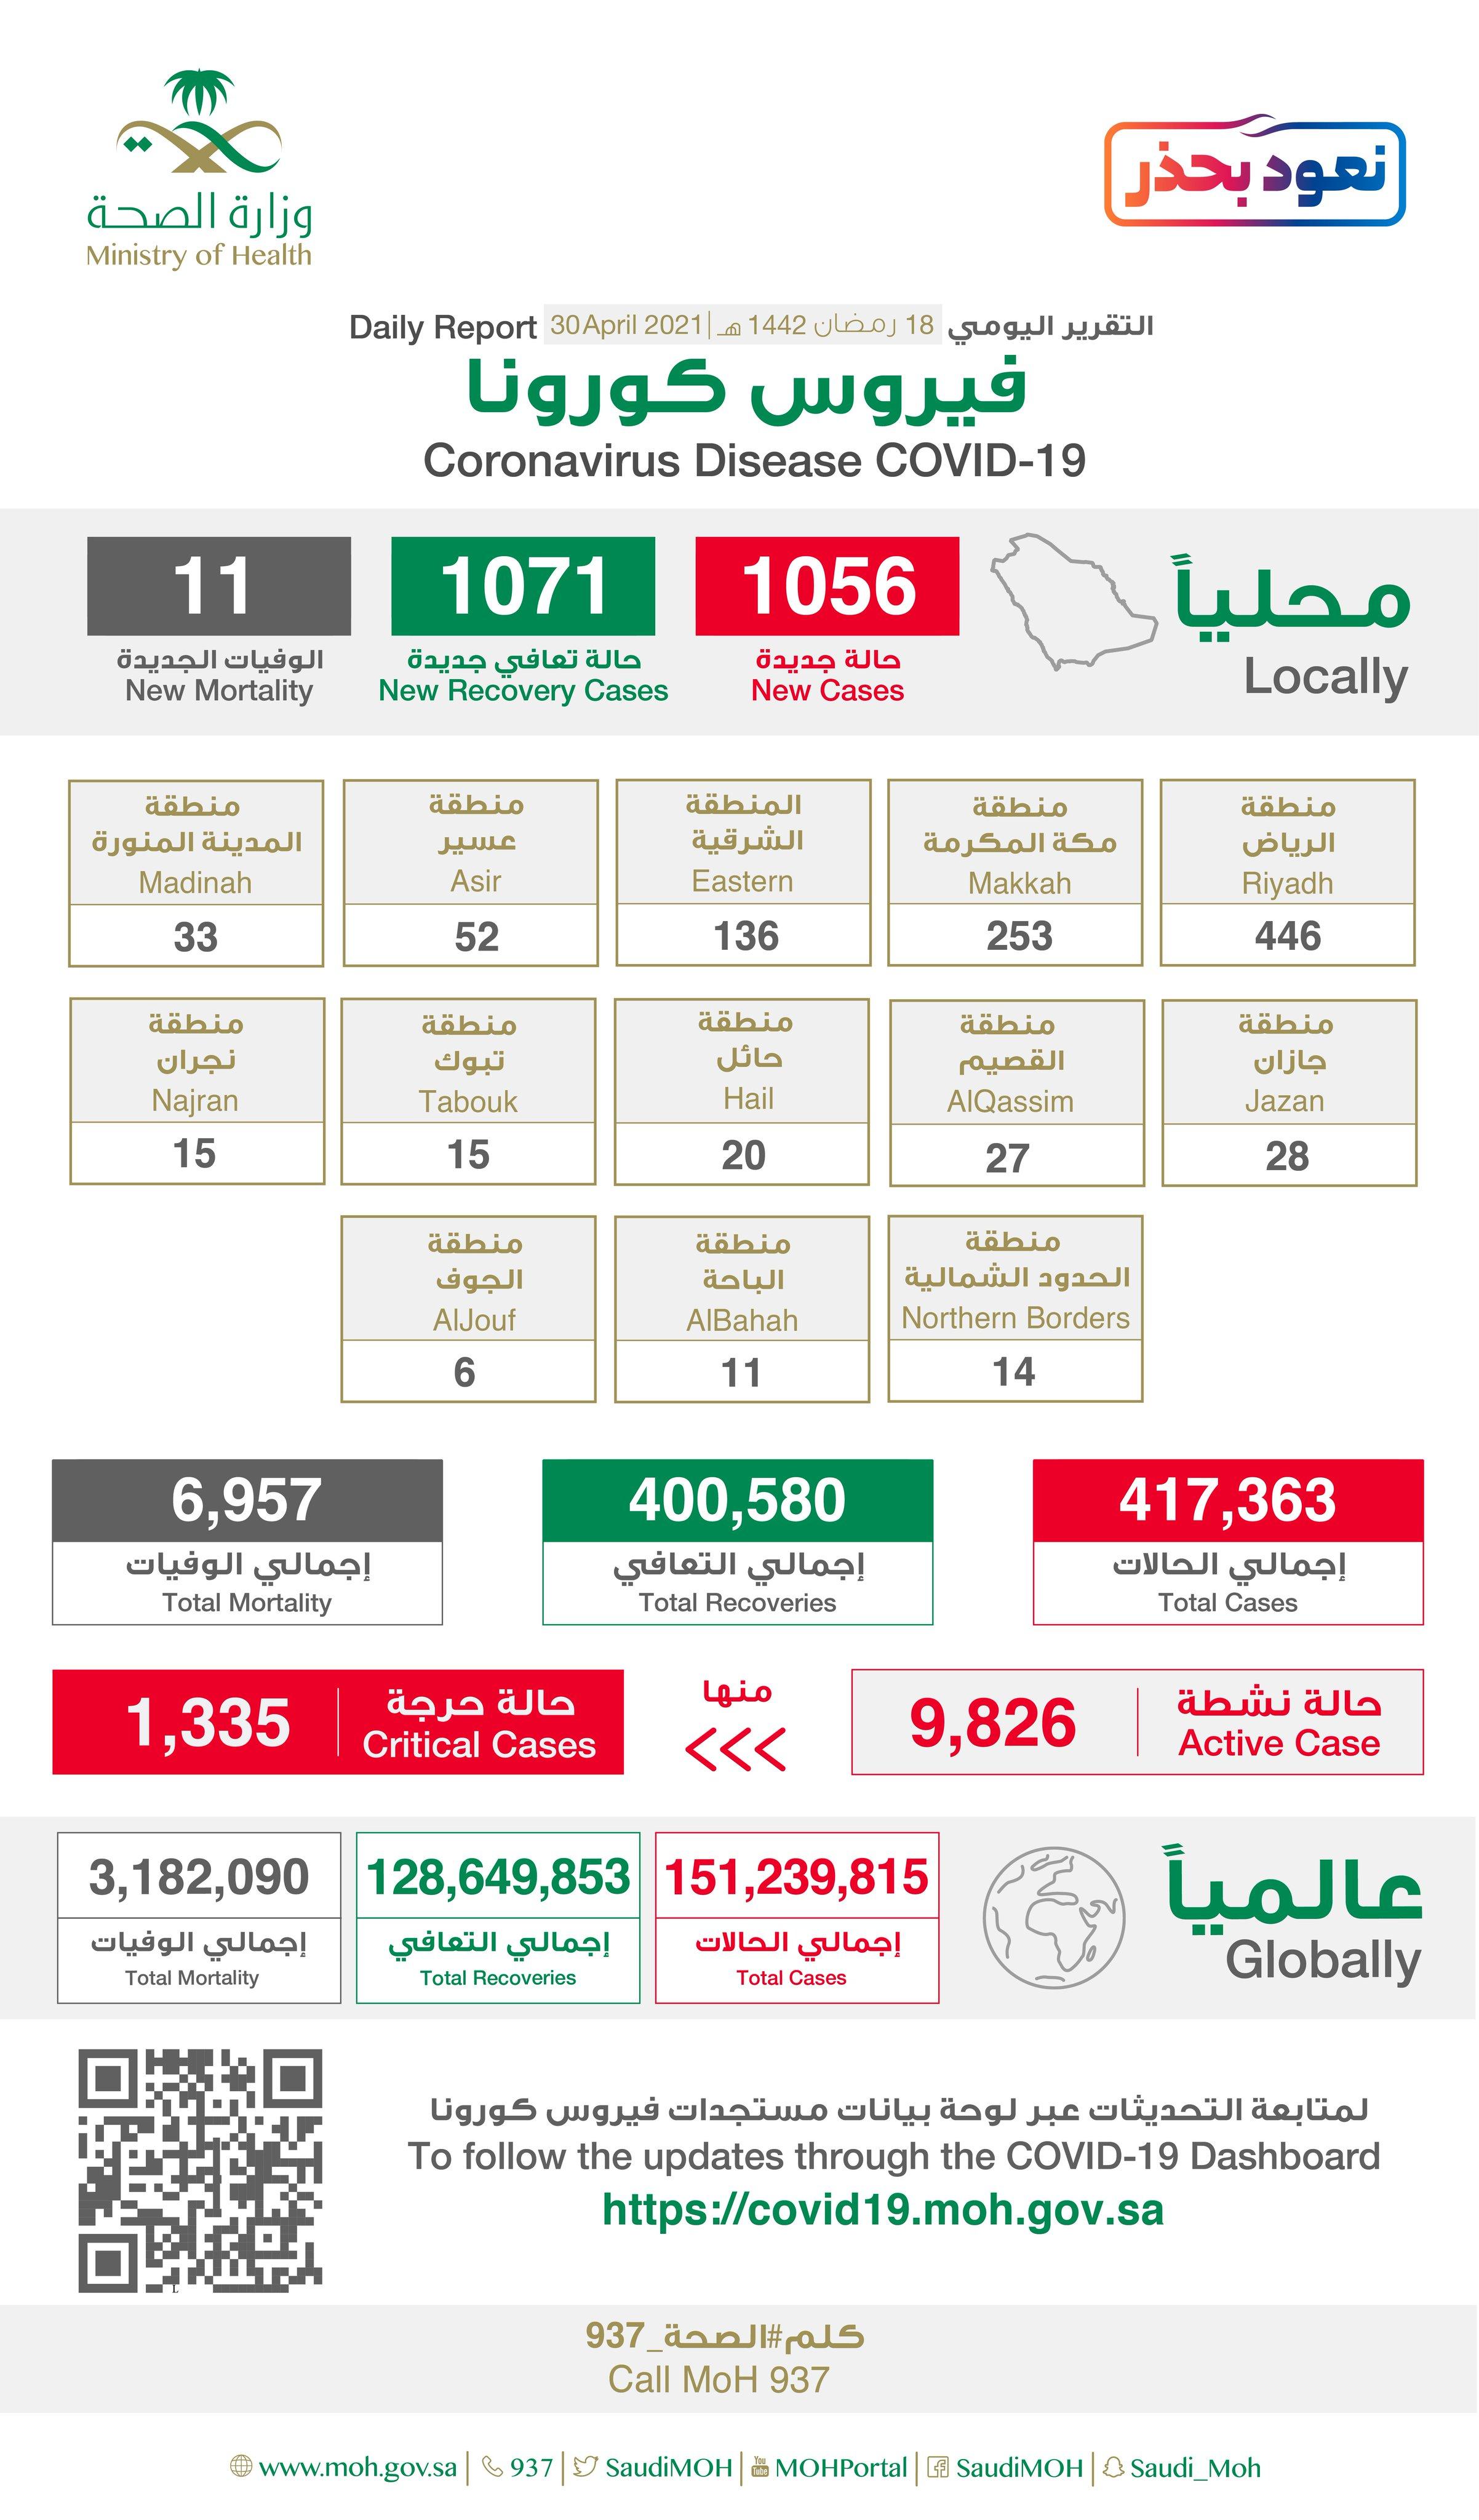 Saudi Arabia Coronavirus : Total Cases :417,363, New Cases : 1,056 , Cured : 400,580 , Deaths: 6,957, Active Cases : 9,826